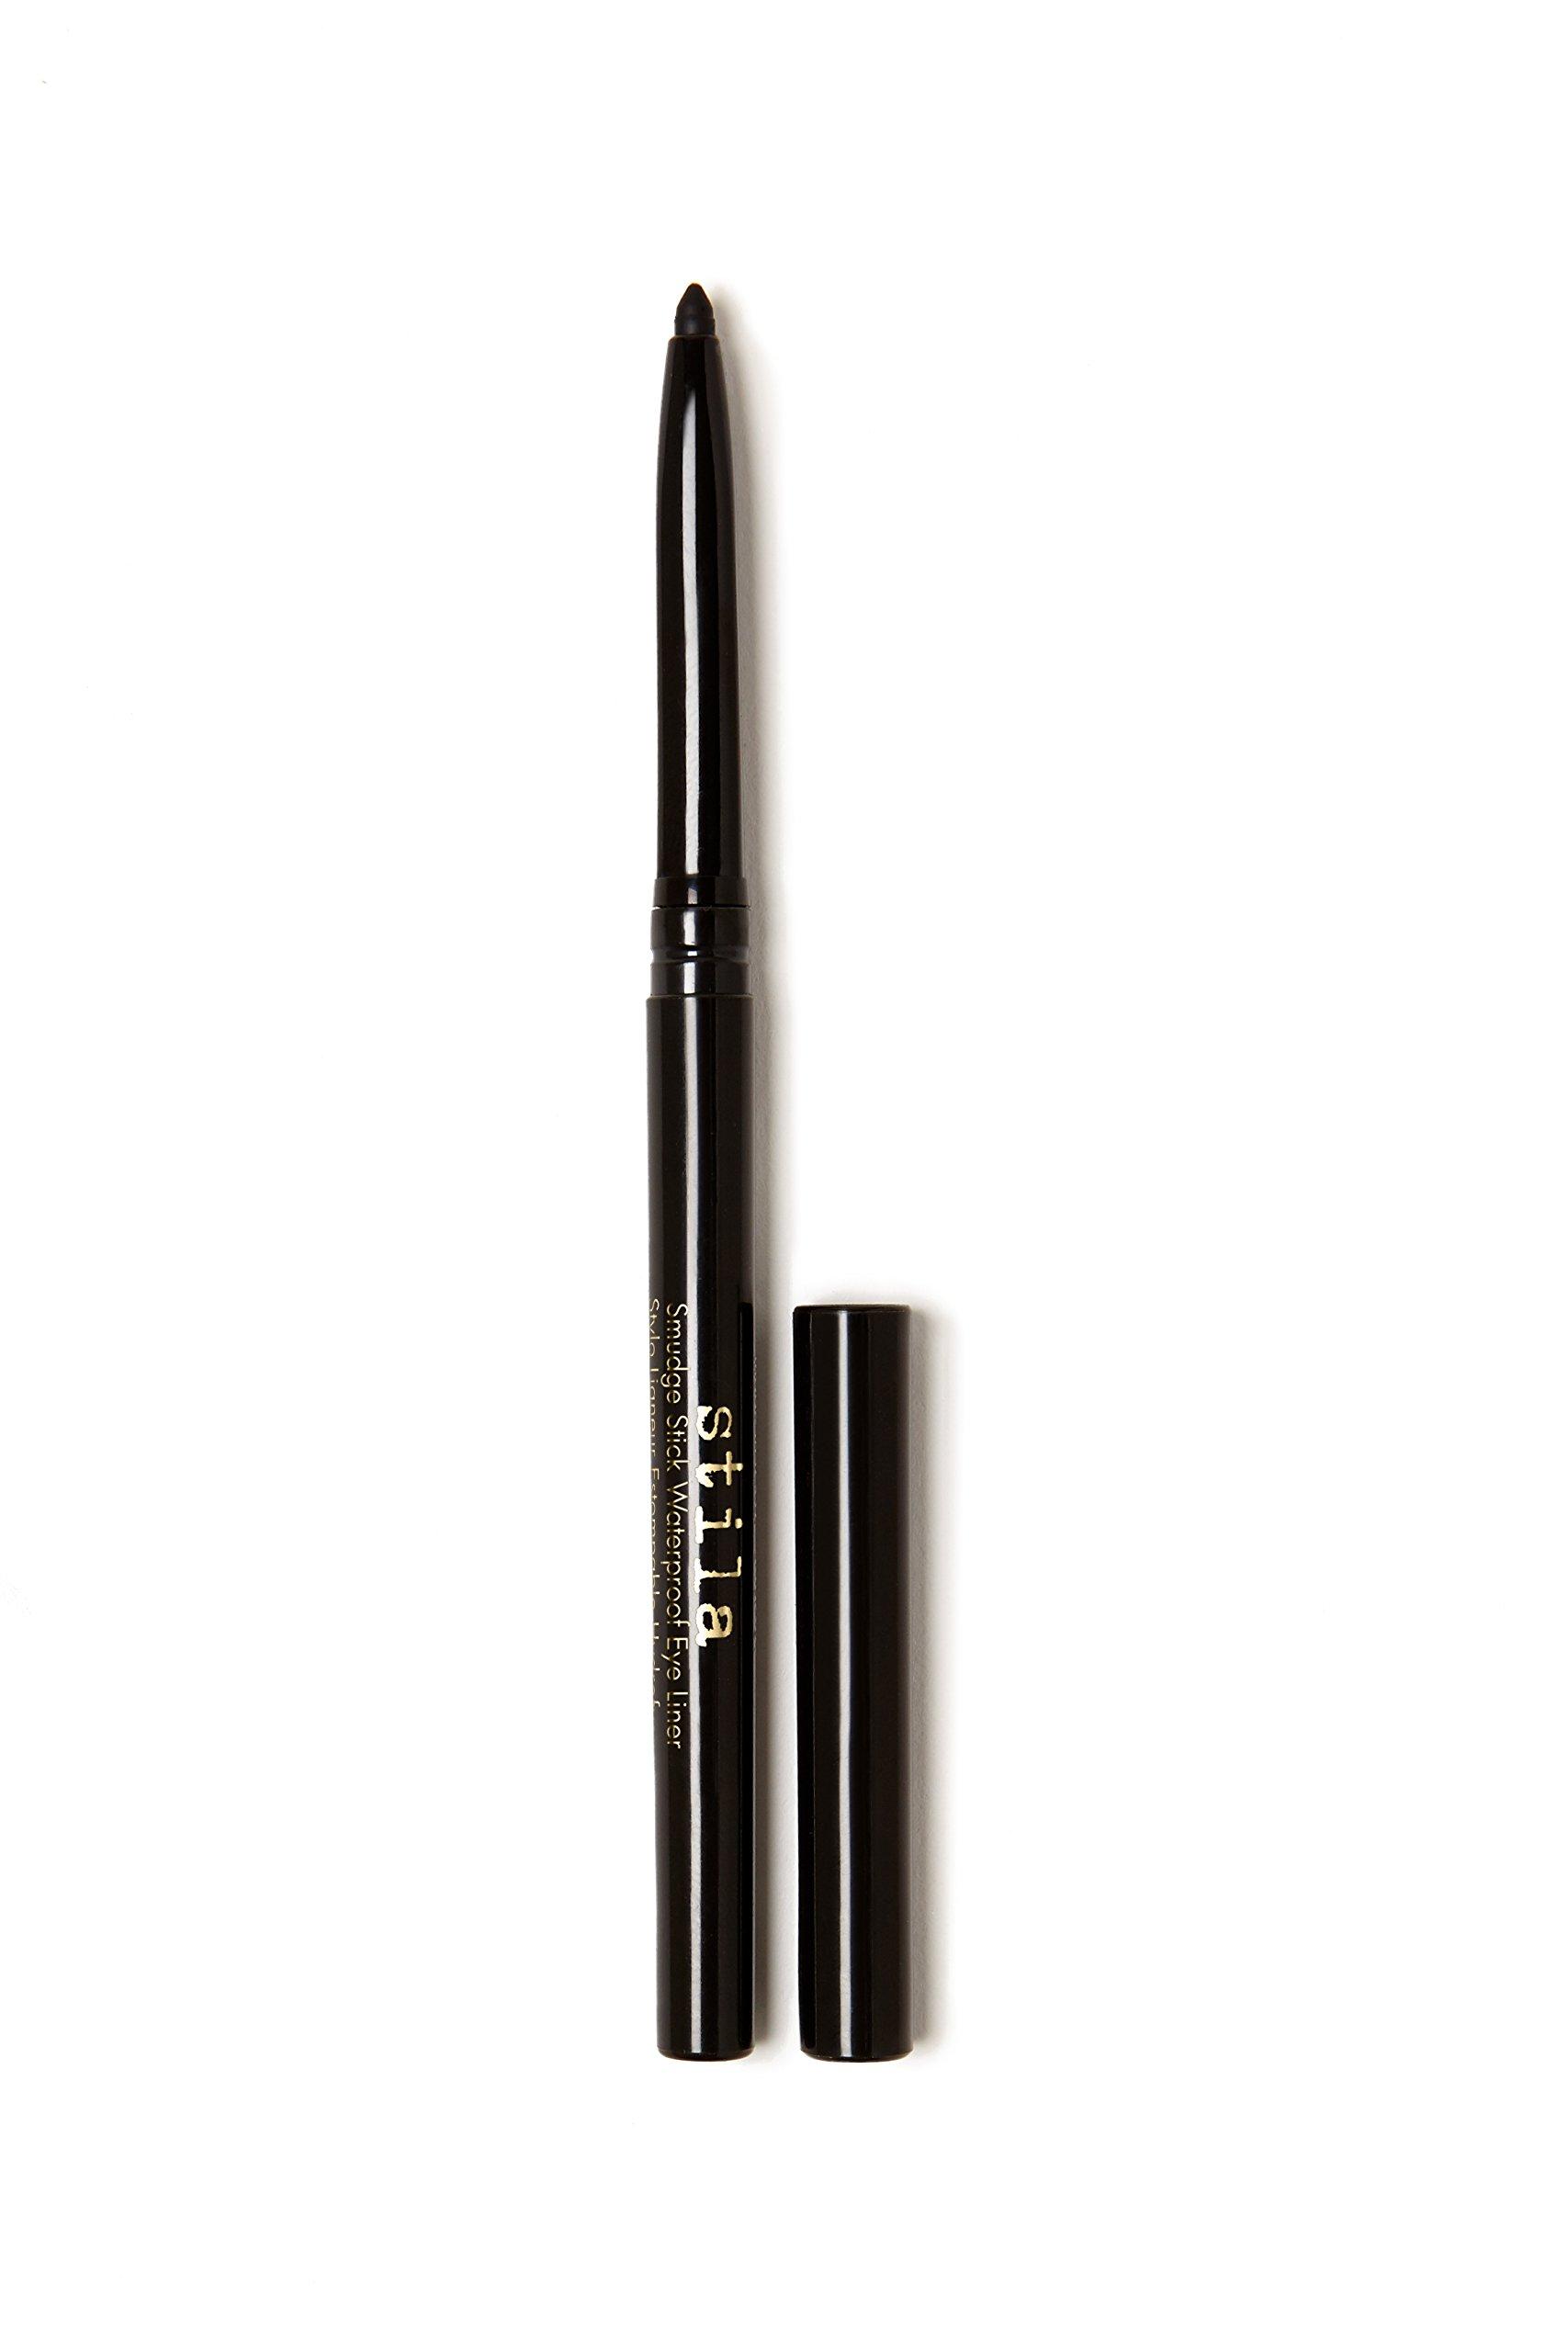 stila Smudge Stick Waterproof Eye Liner, Stingray (Jet Black)